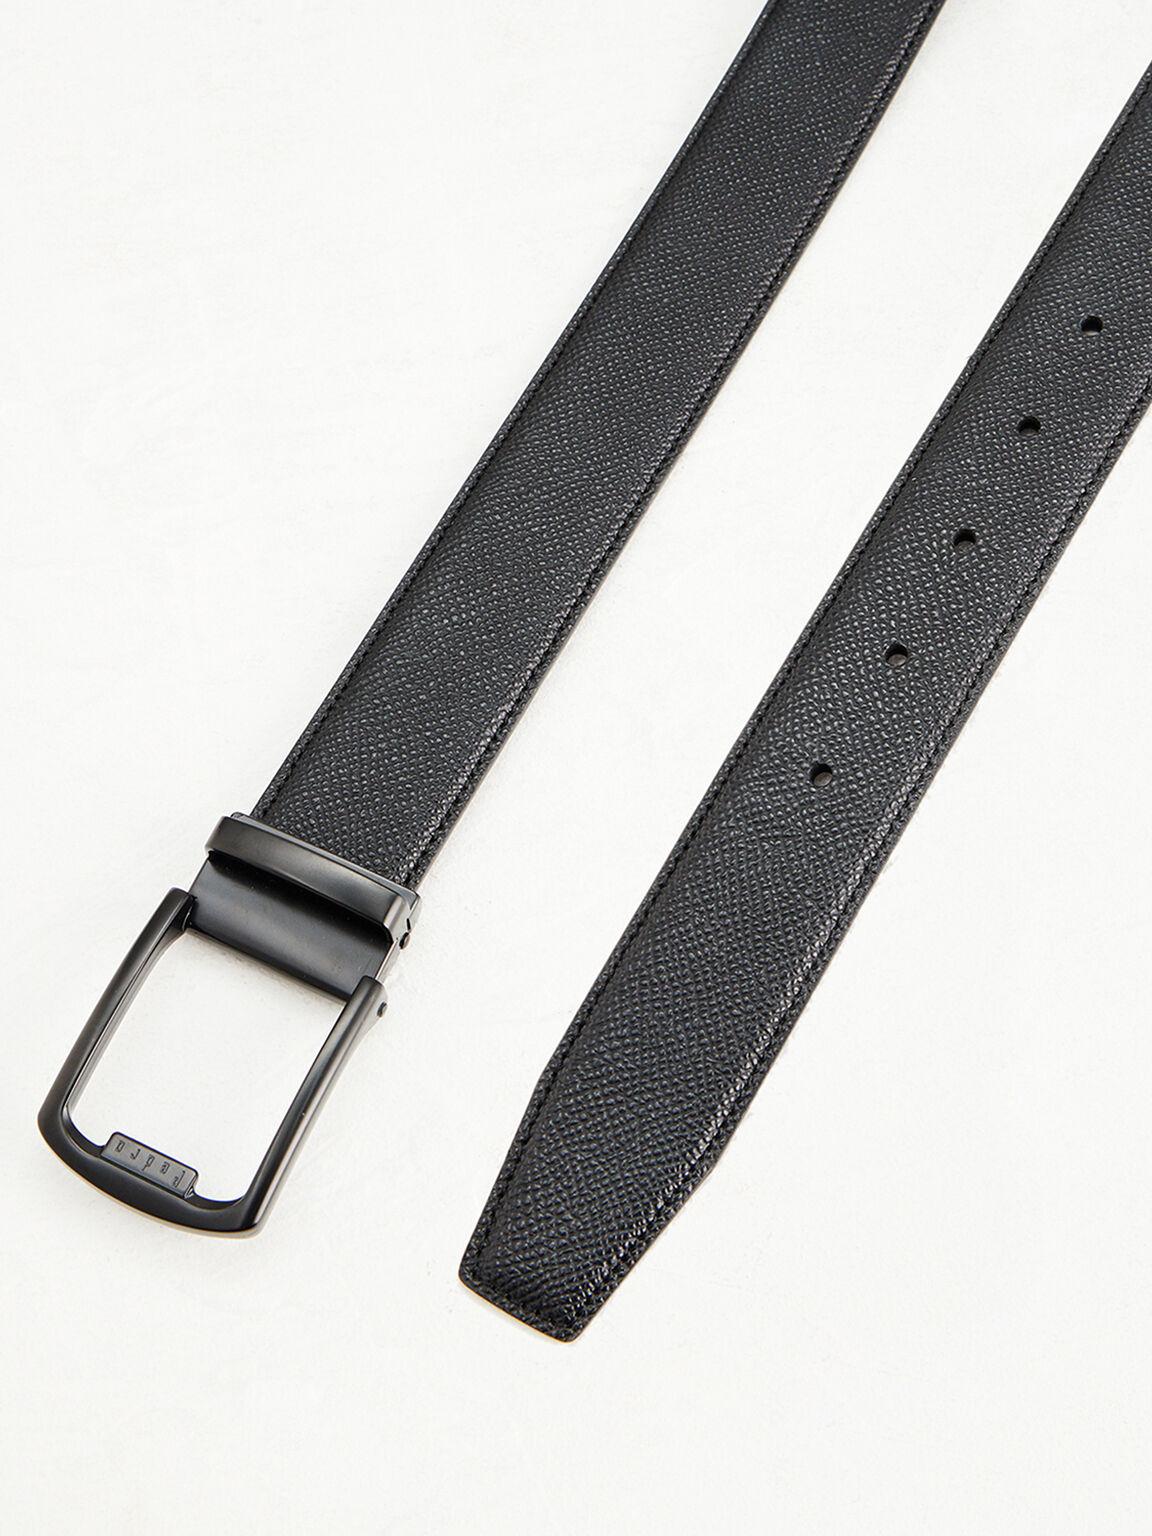 Embossed Leather Tang Belt, Black, hi-res